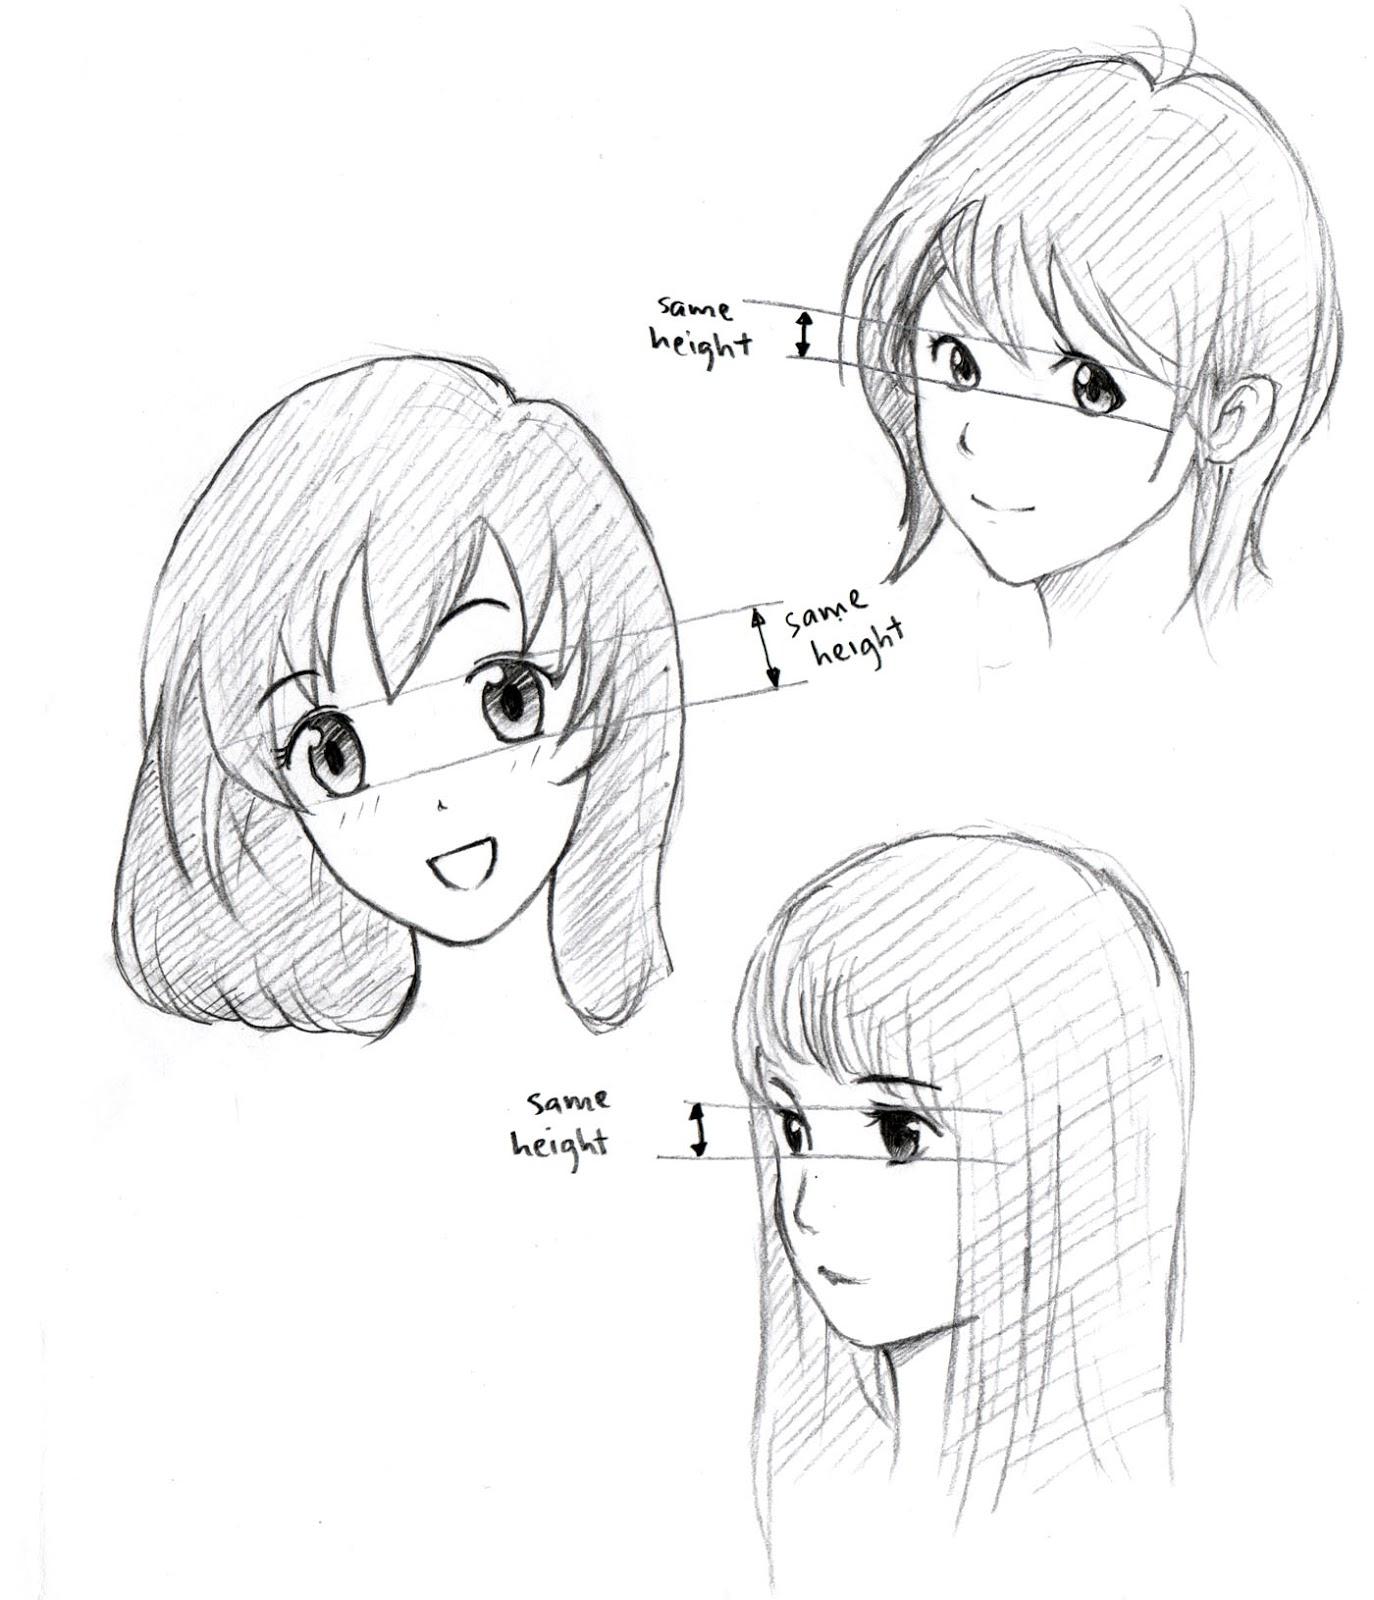 Drawn manga This be of the same